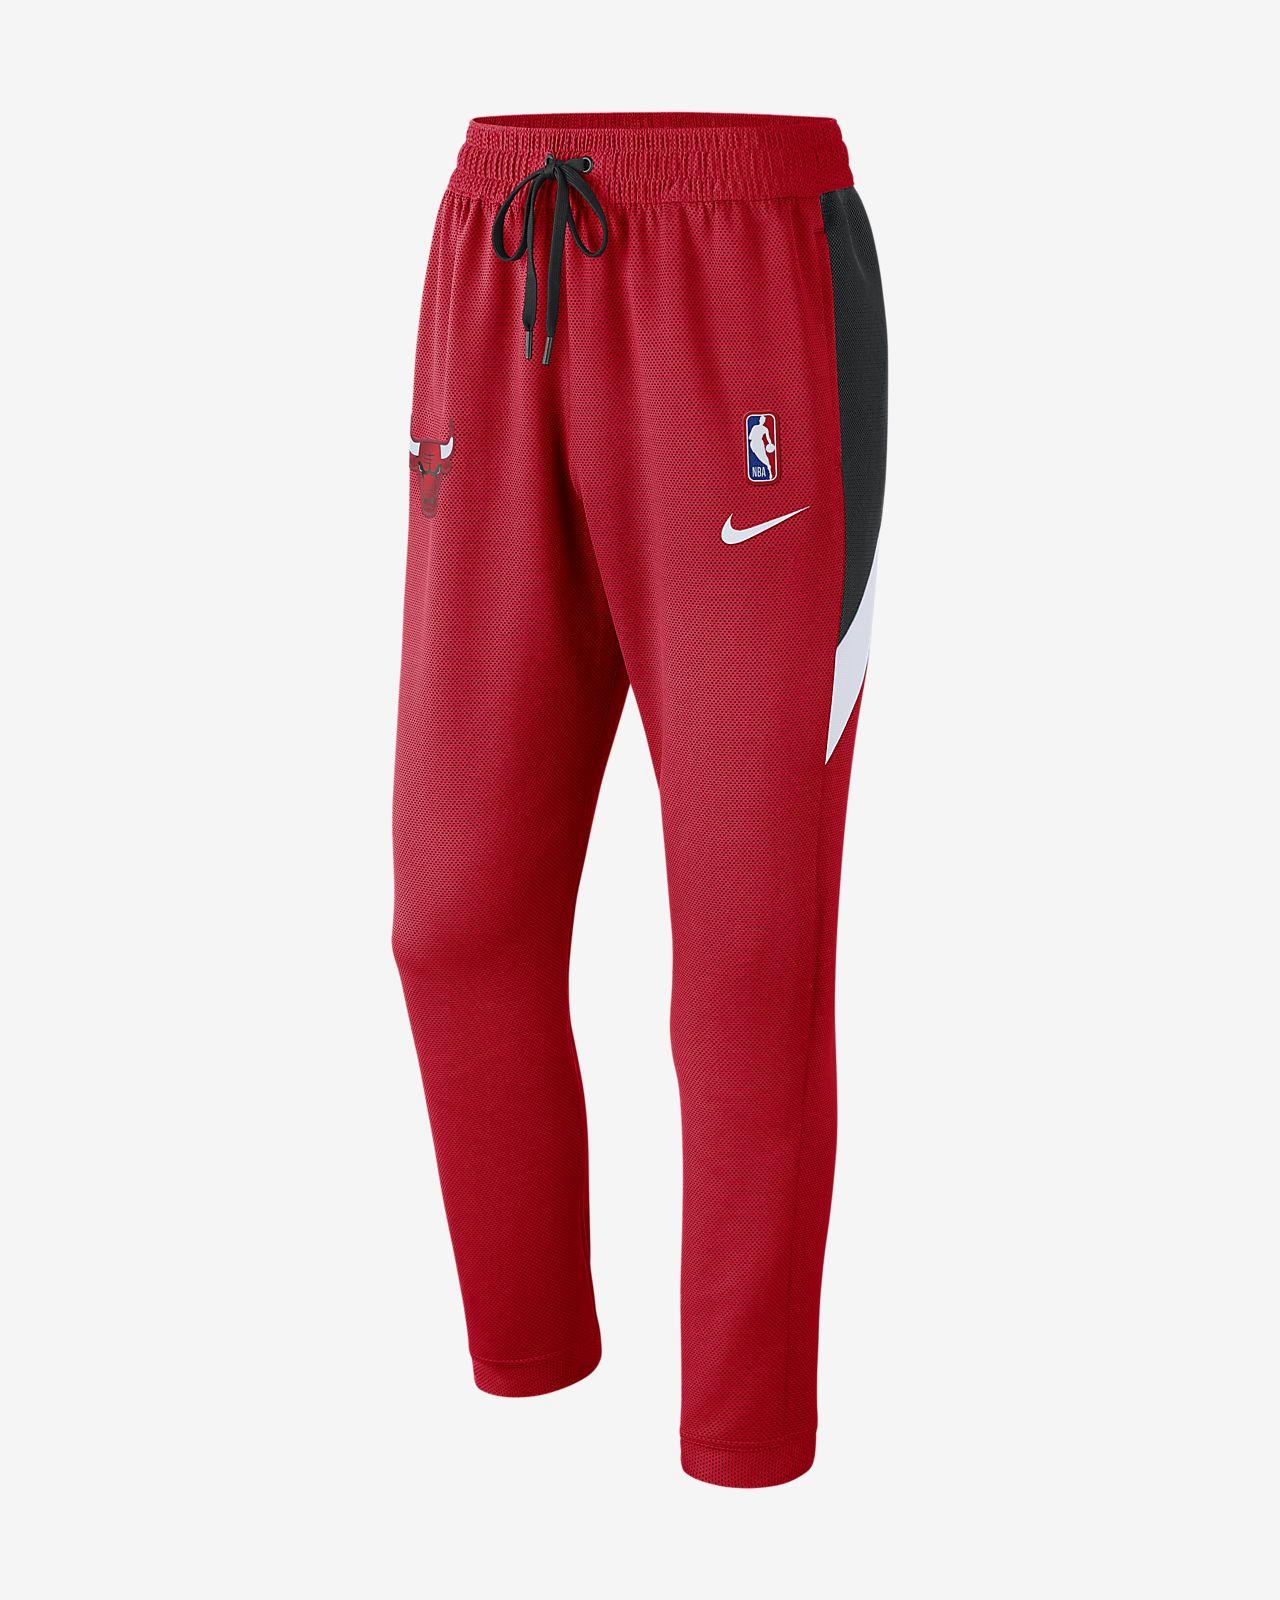 Мужские брюки НБА Chicago Bulls Nike Therma Flex Showtime